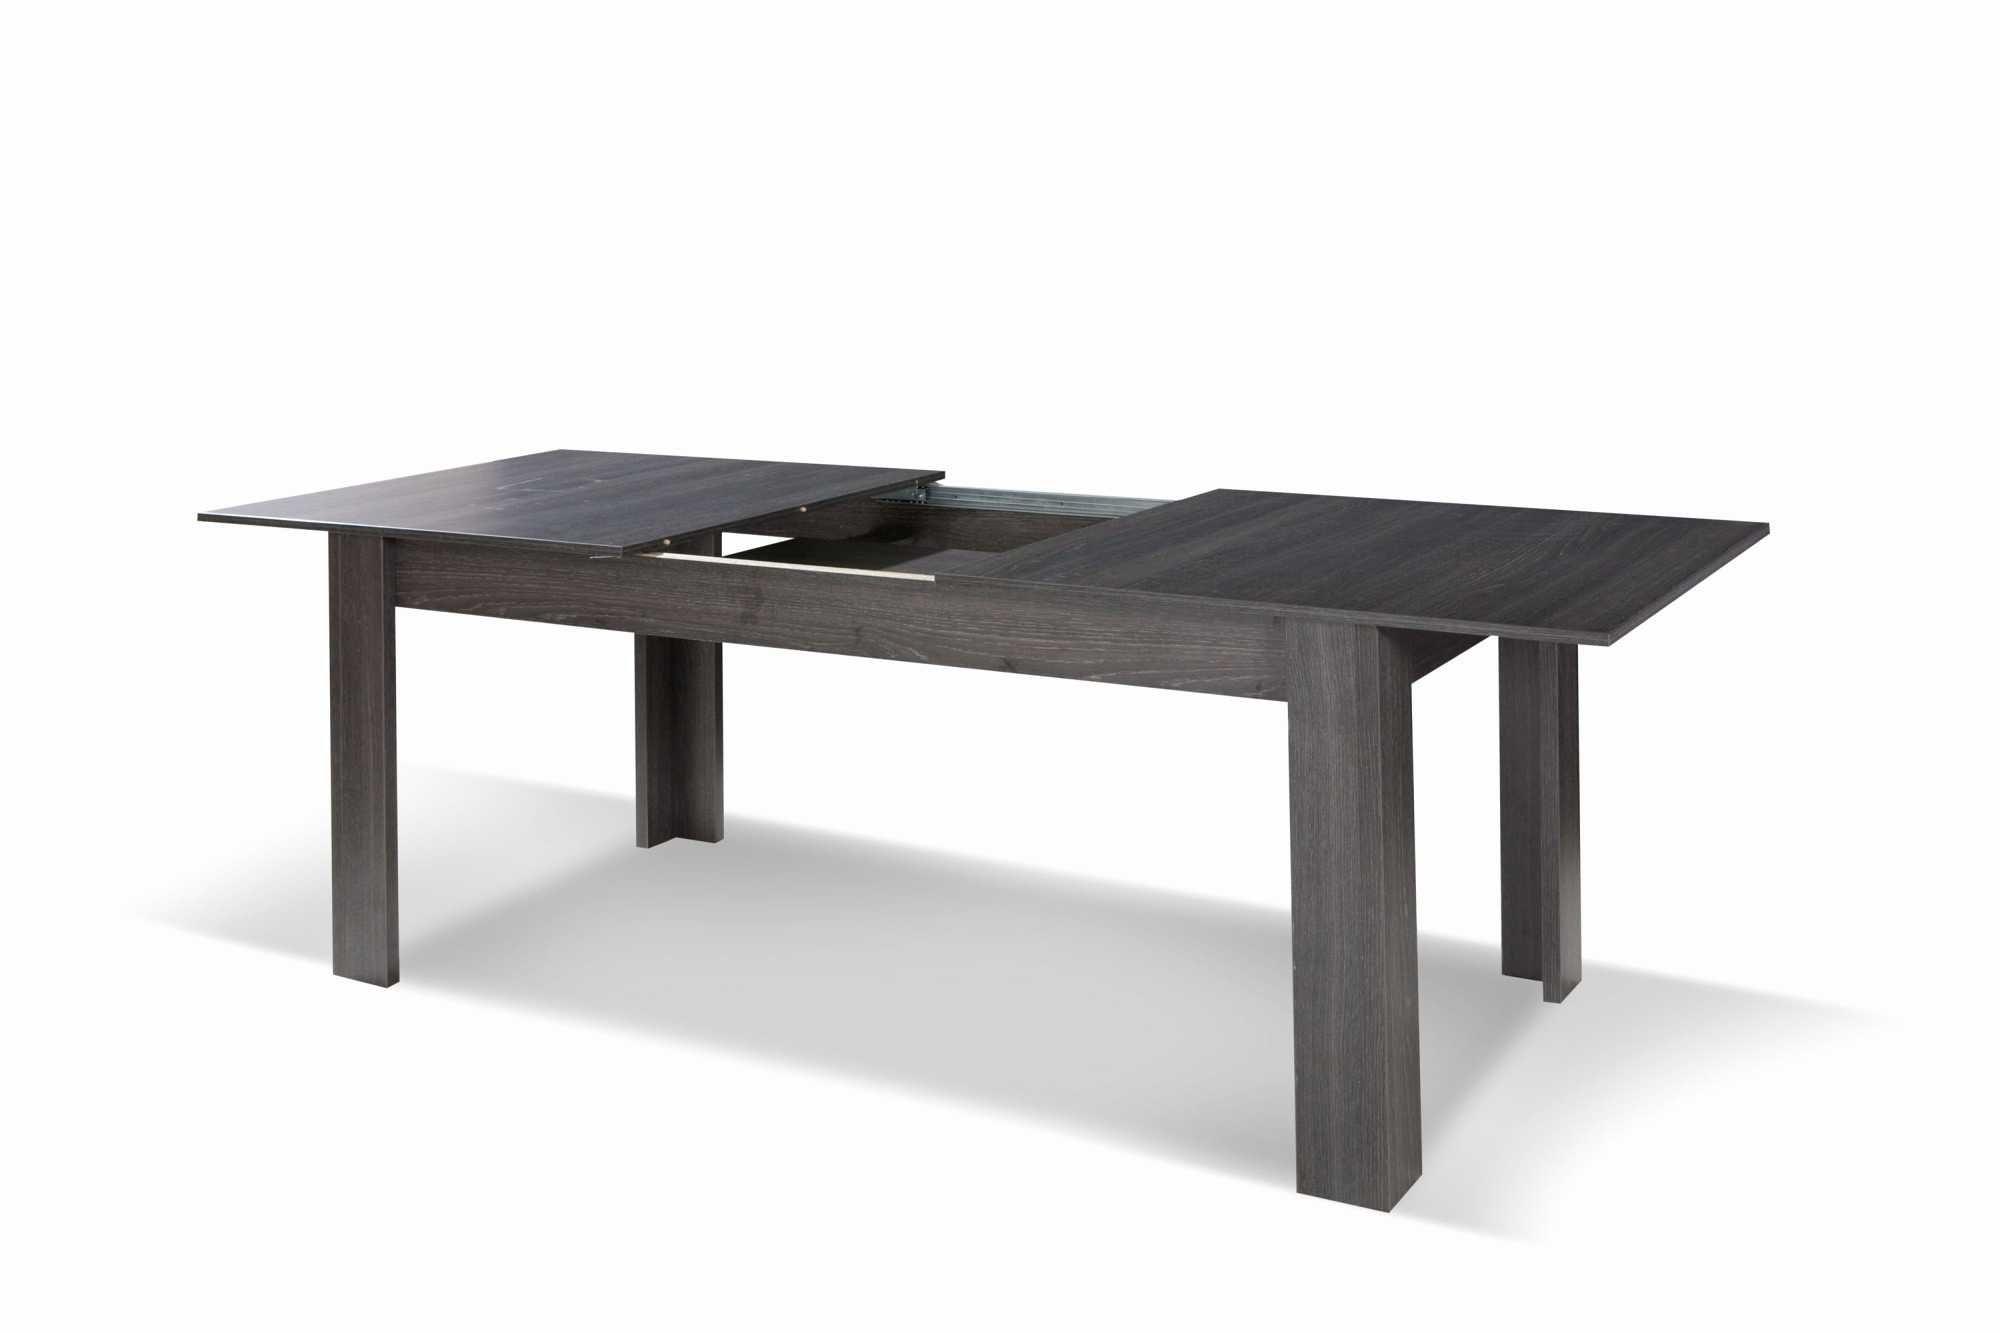 Table Salle A Manger Pliante Design De Maison Table Salle A Manger Pliante Ikea 2017 Et Table Salle A Manger Table A Manger Ovale Table A Manger Avec Rallonge